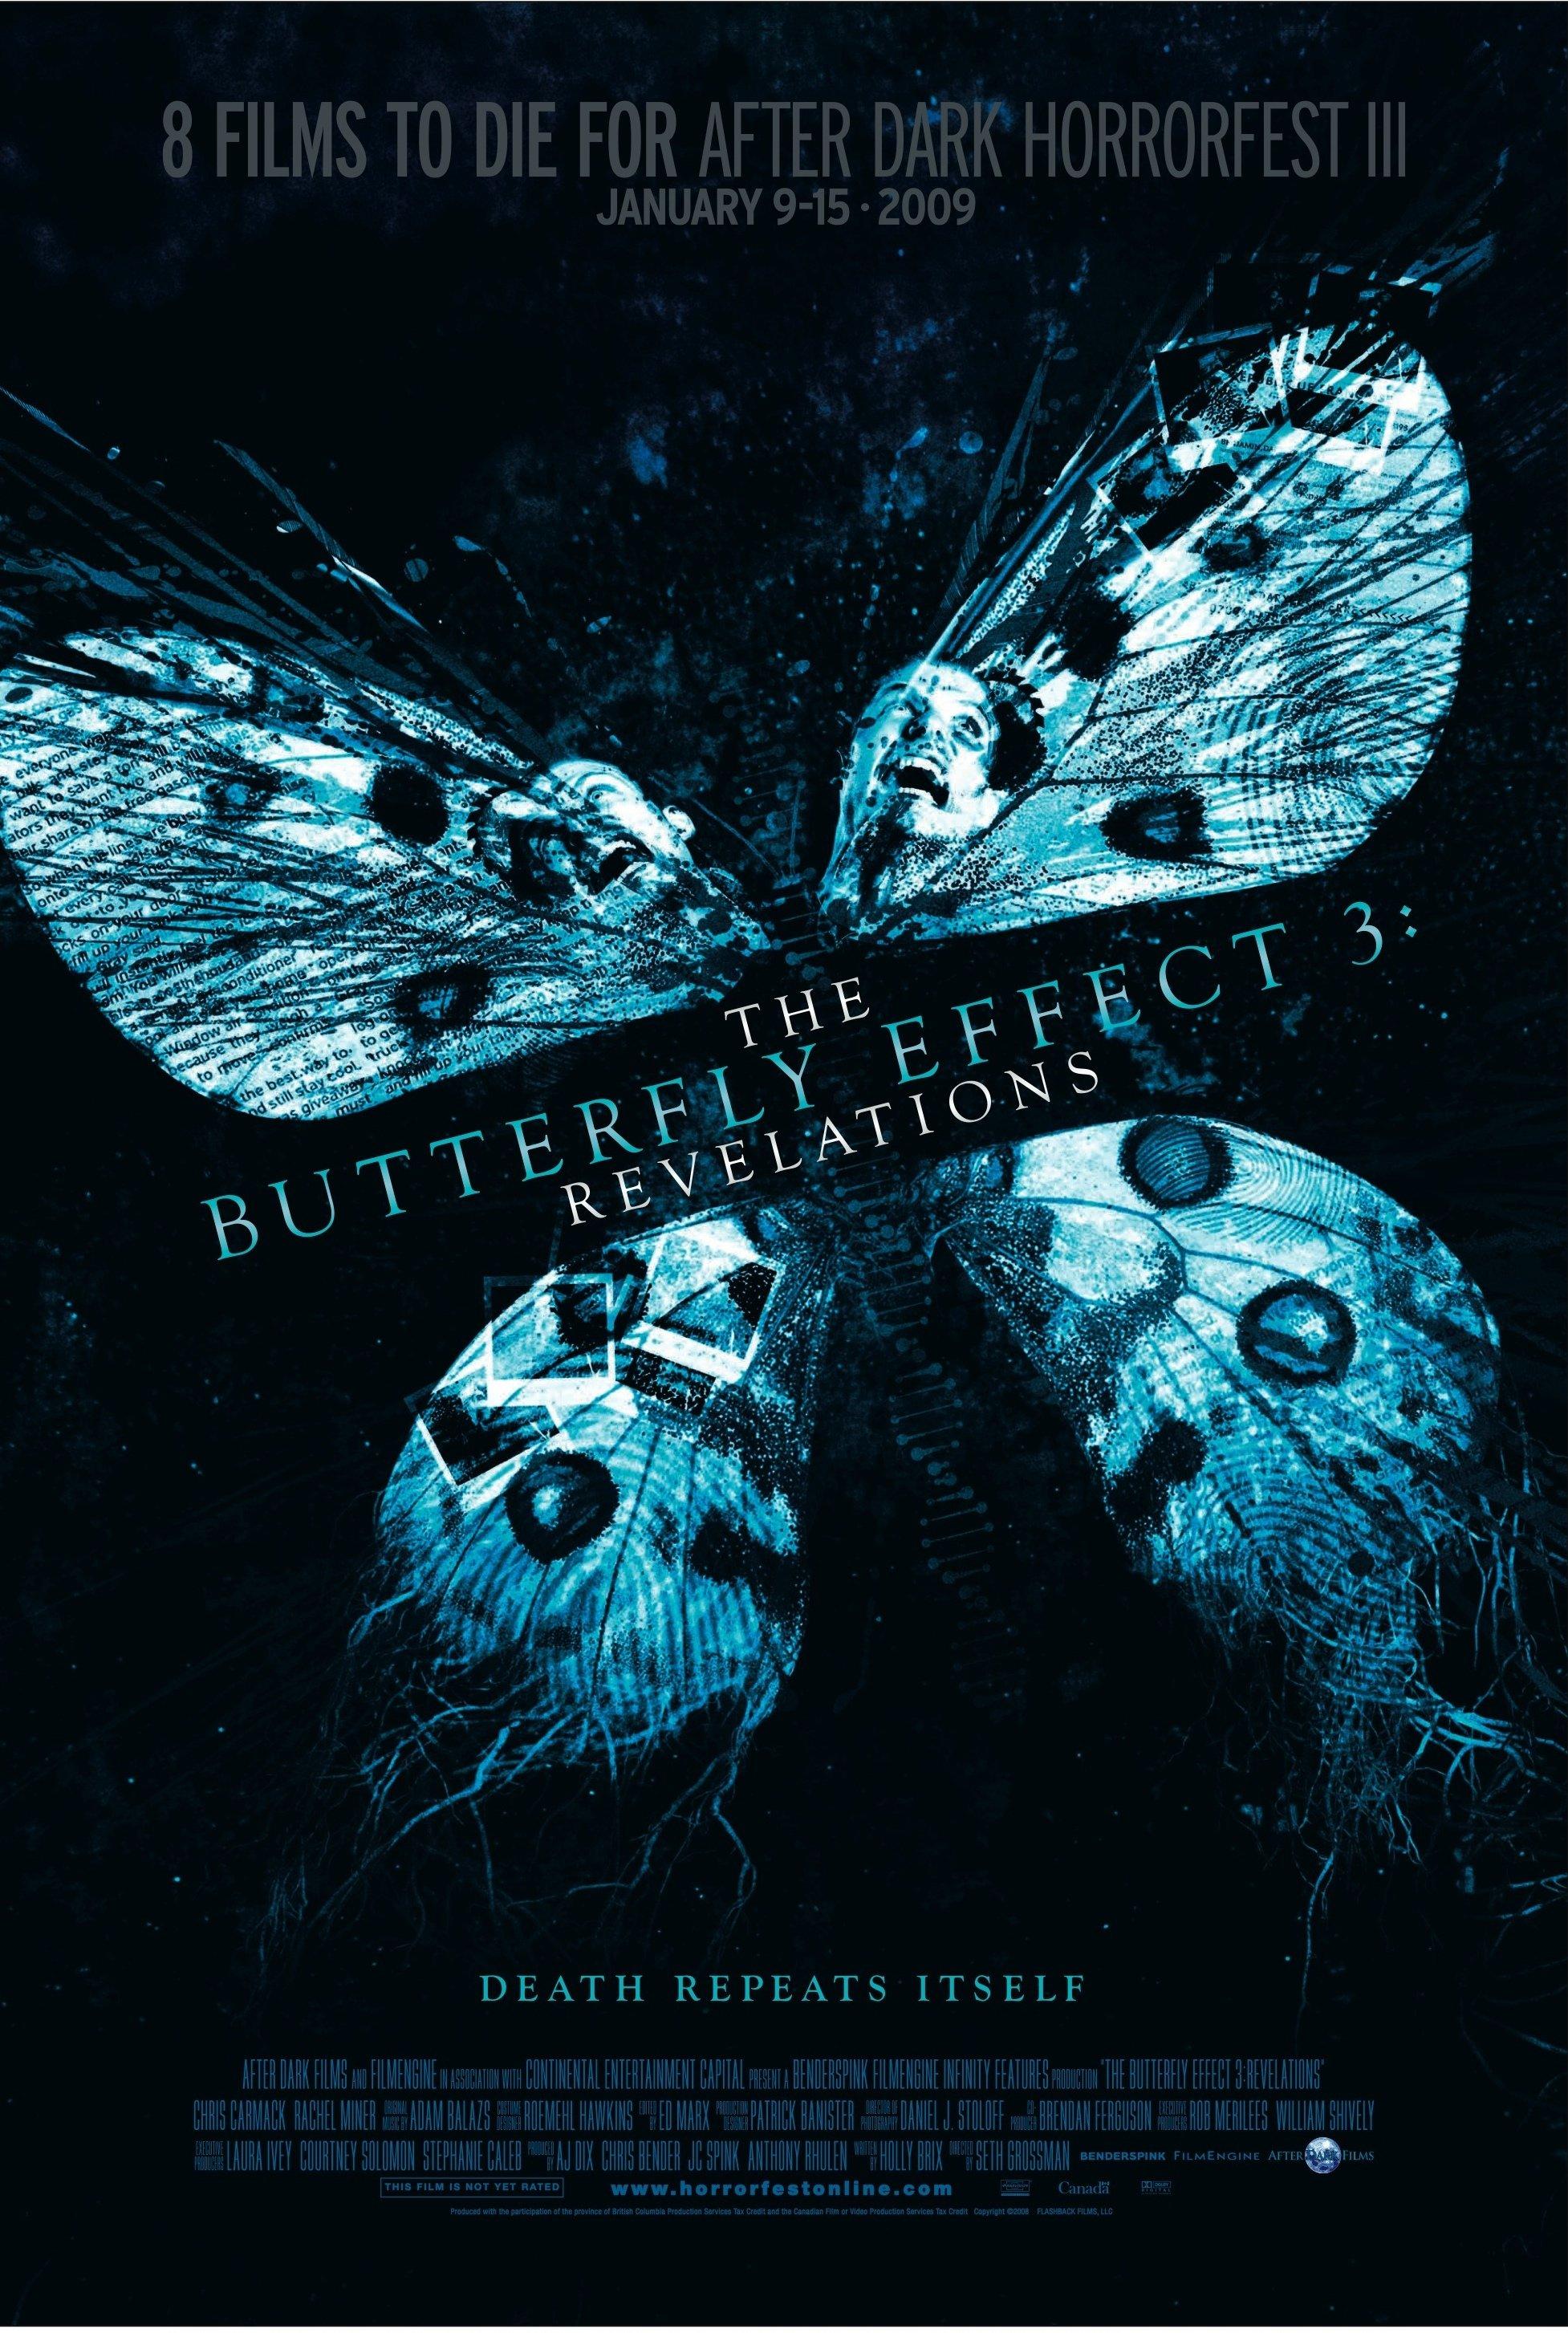 The Butterfly Effect 3: Revelations kapak